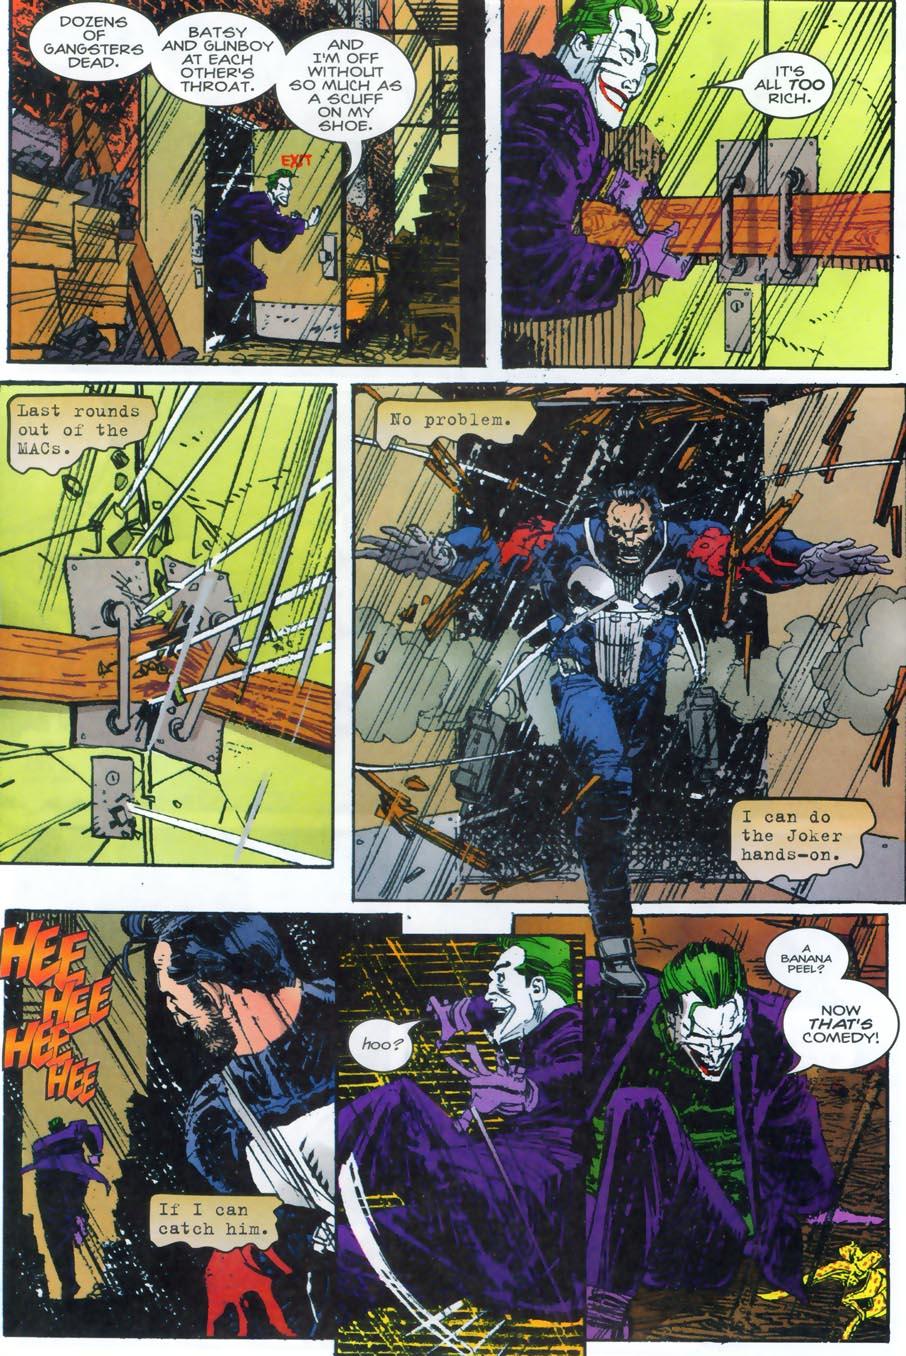 Punisher vs. Batman